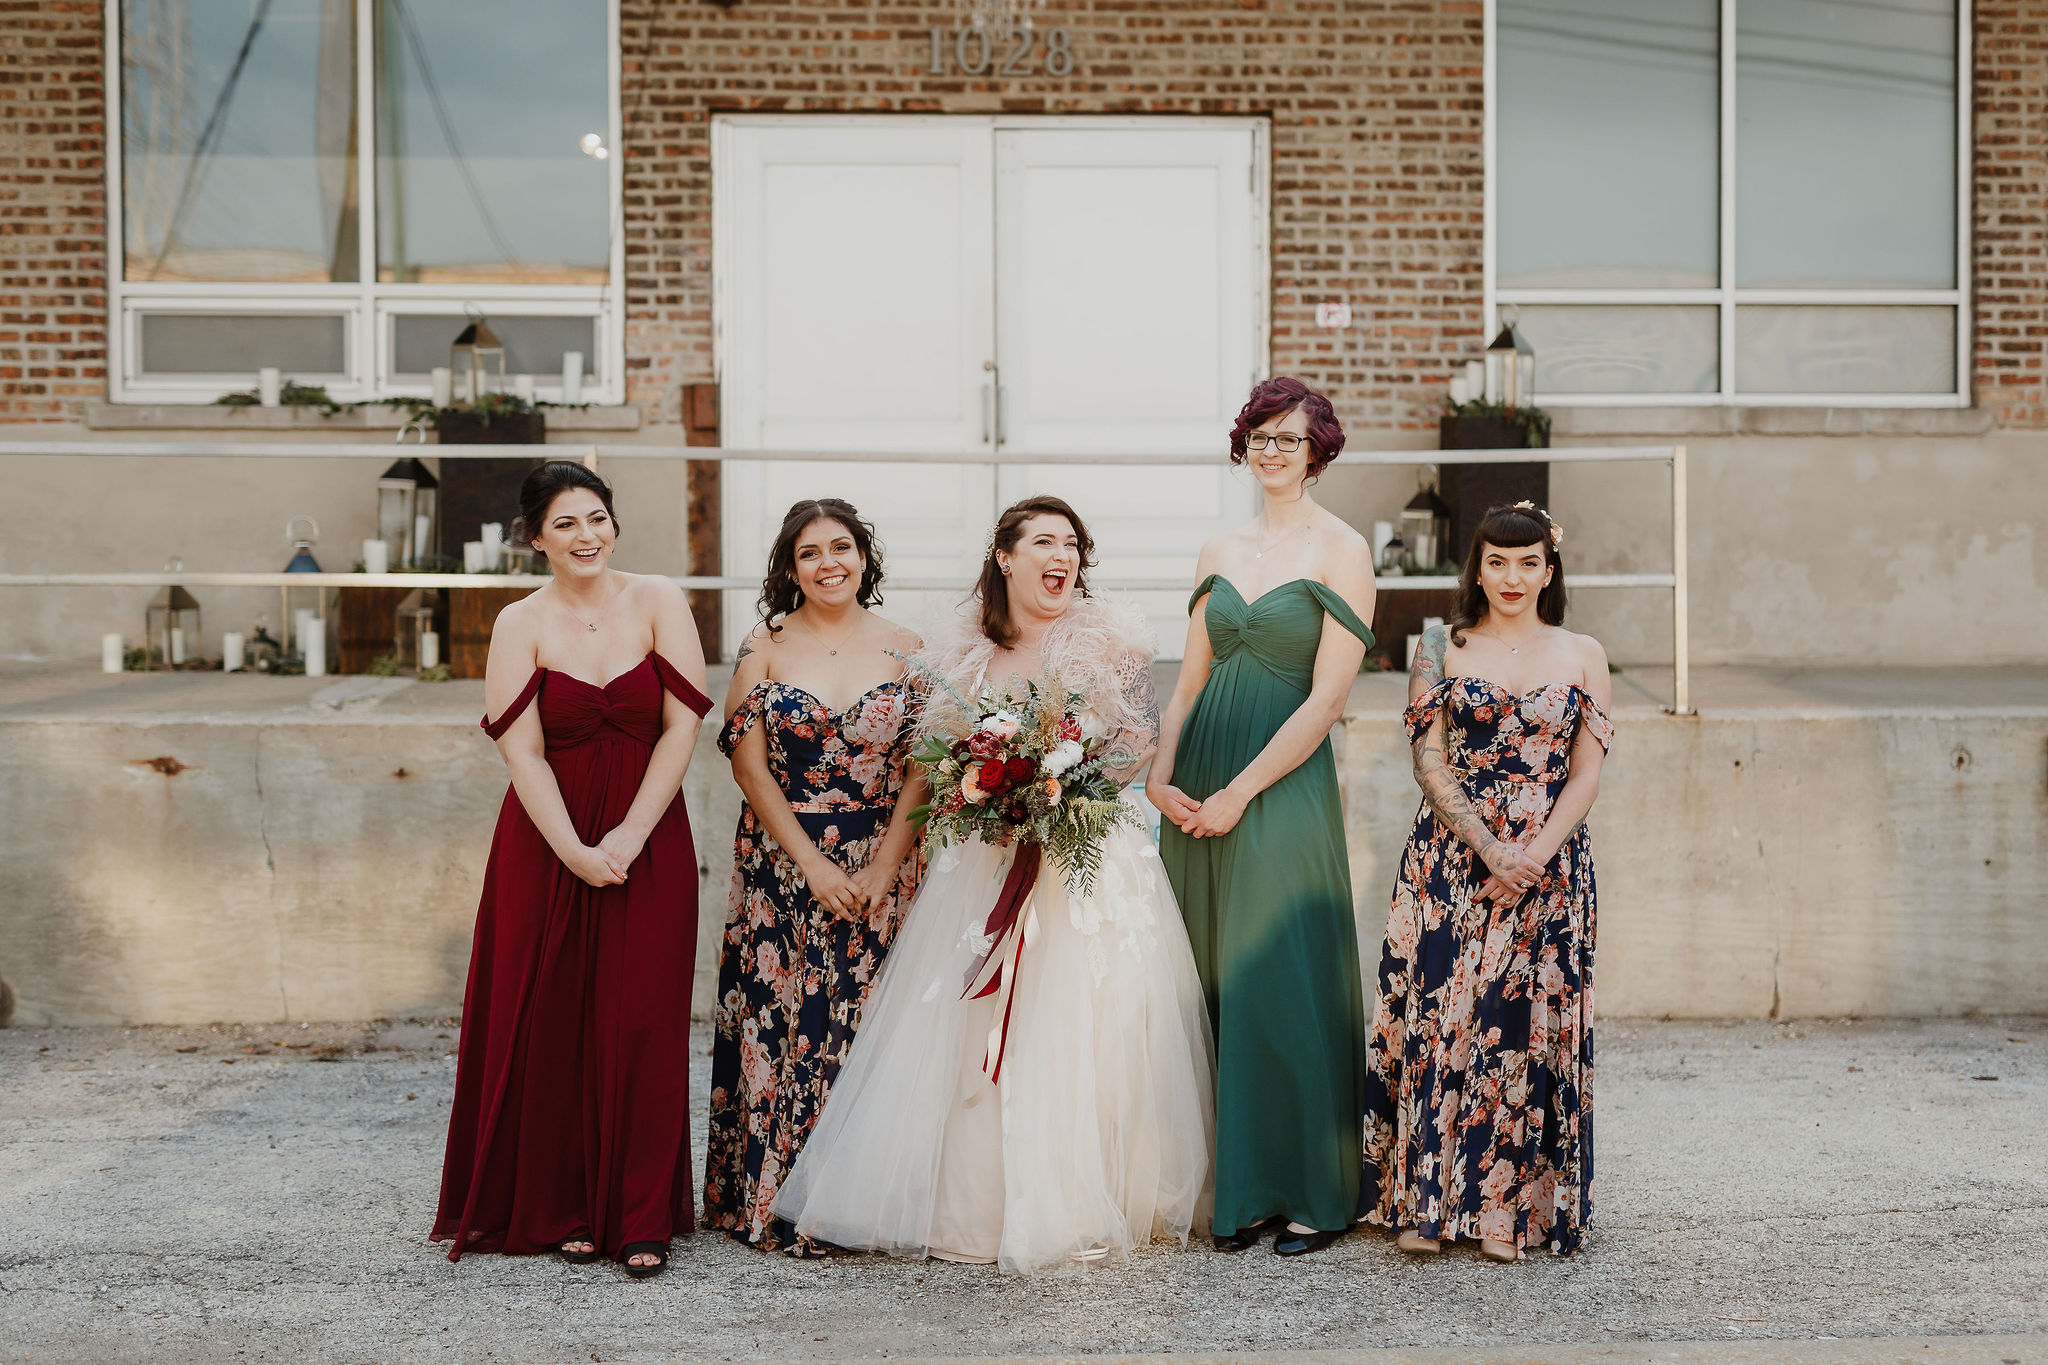 Rustic Yet Glam Midnight Garden Inspired Winter Wedding ...